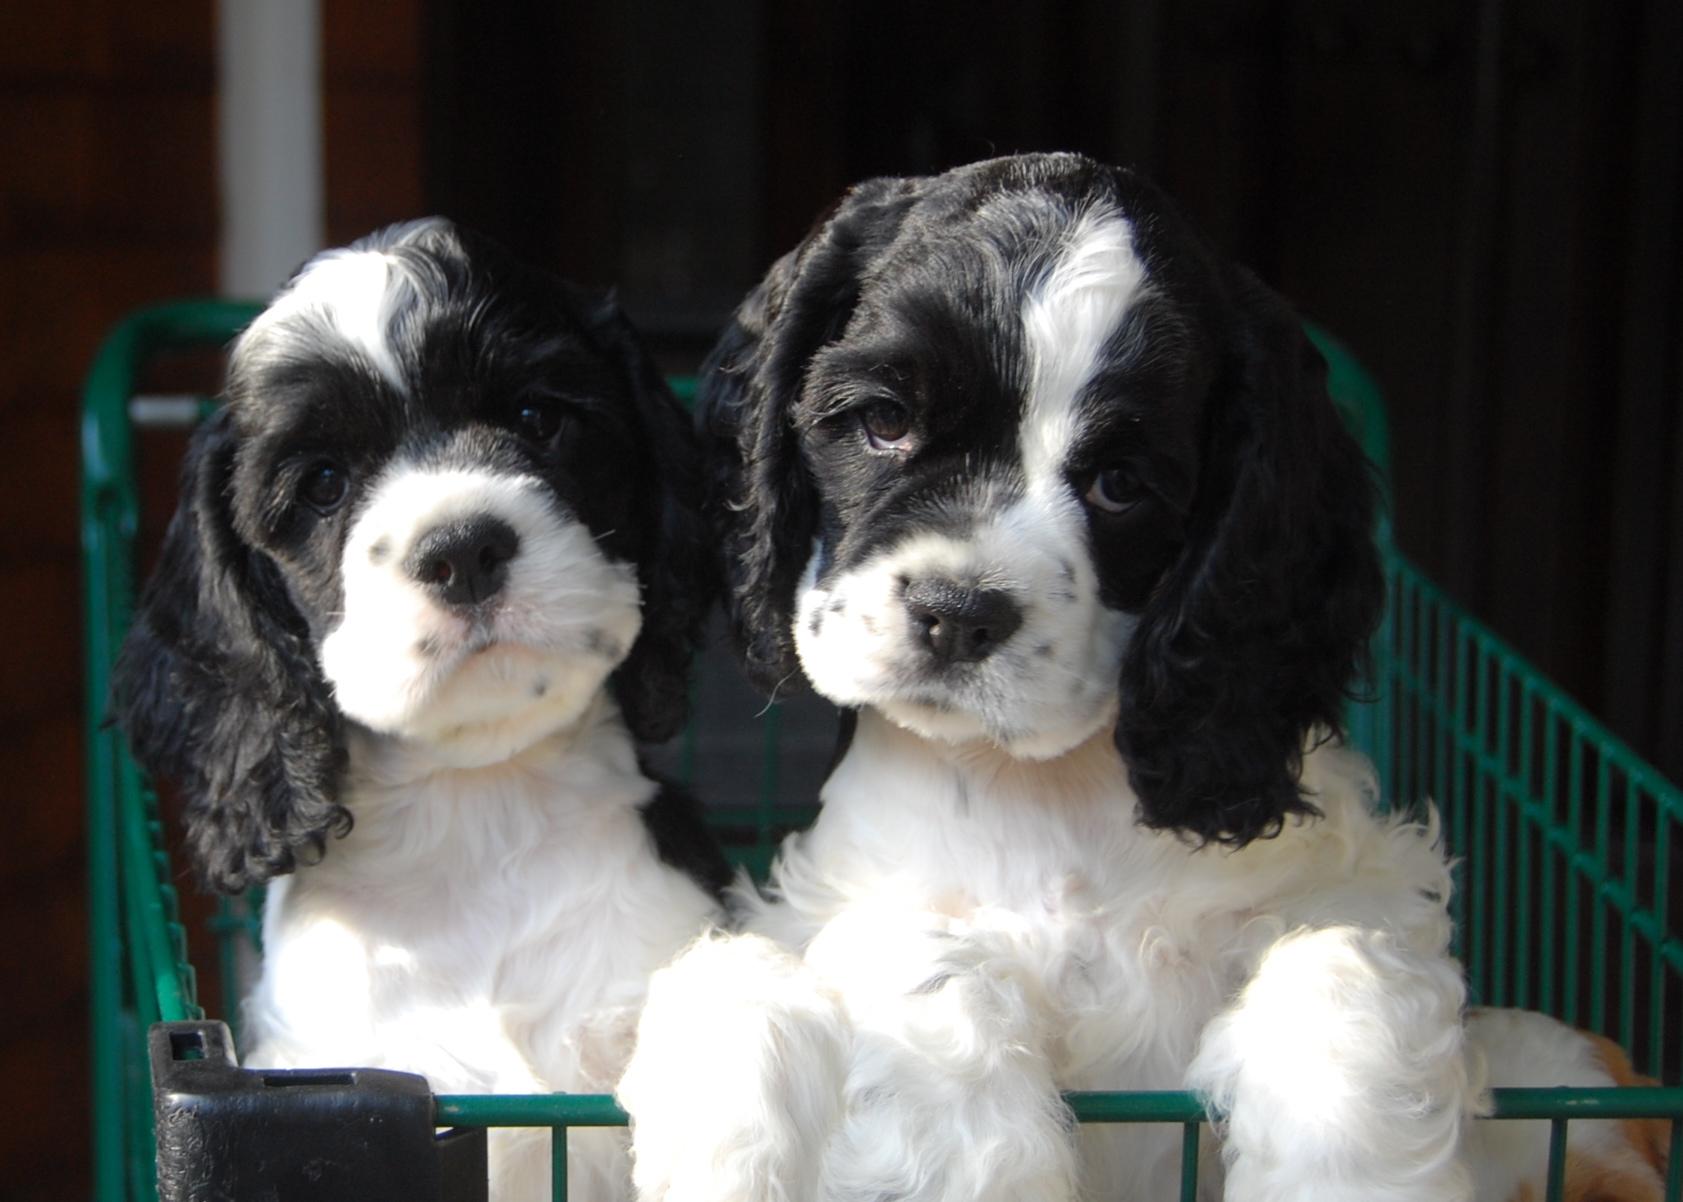 Ch. Jimbo & Ch. Jypsy as Puppies